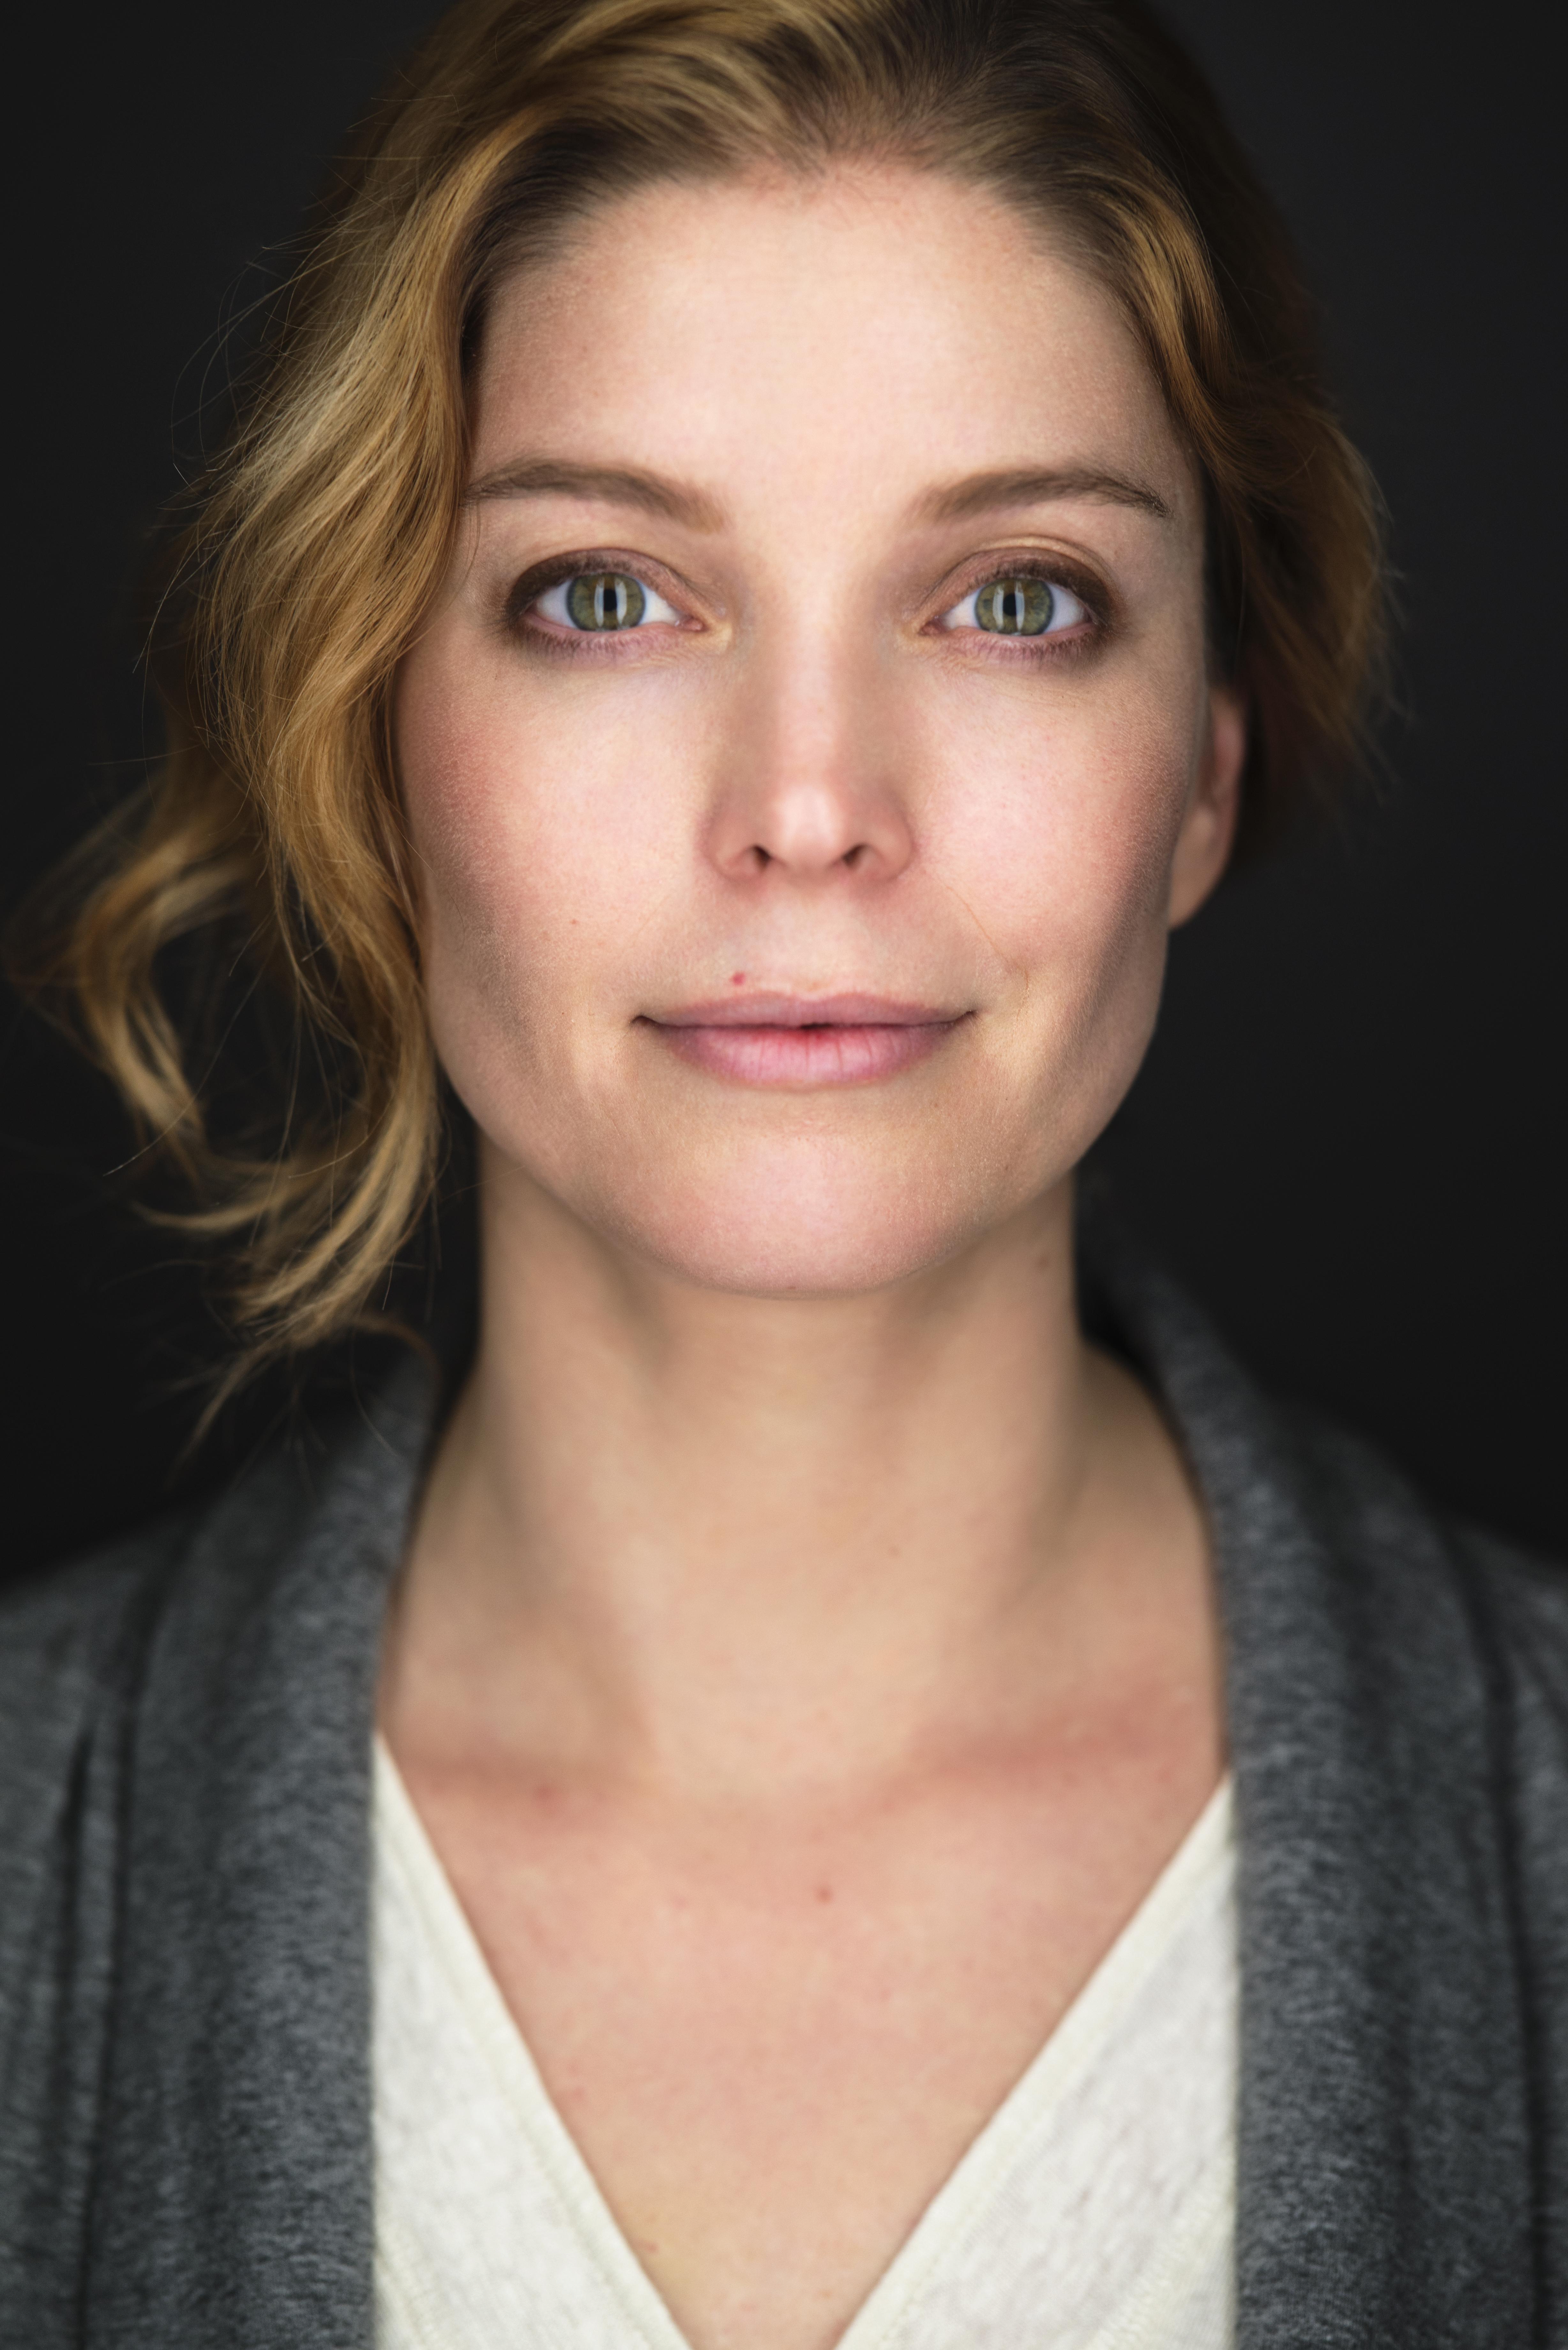 JohannaPutnam4